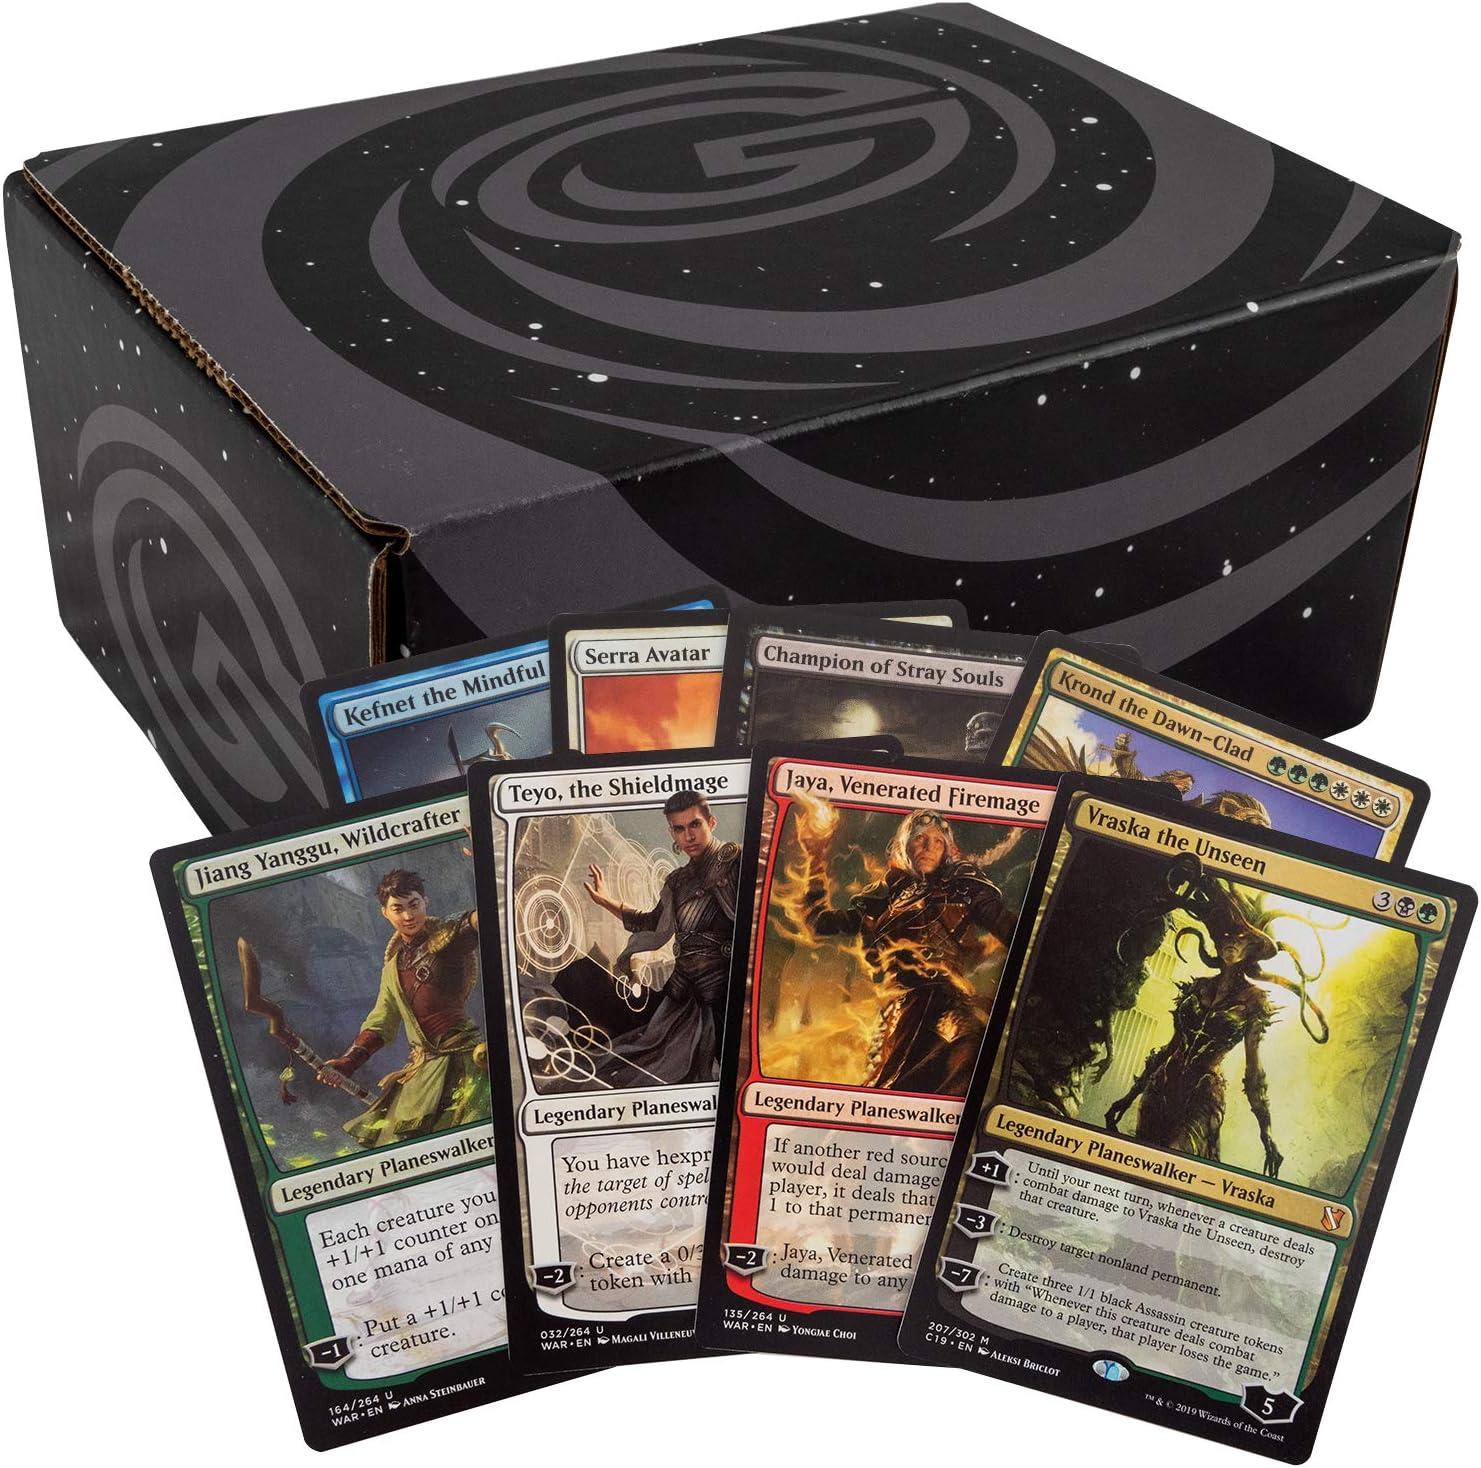 Lot of 50 Magic cards War of the spark Foils Planeswalkers See description